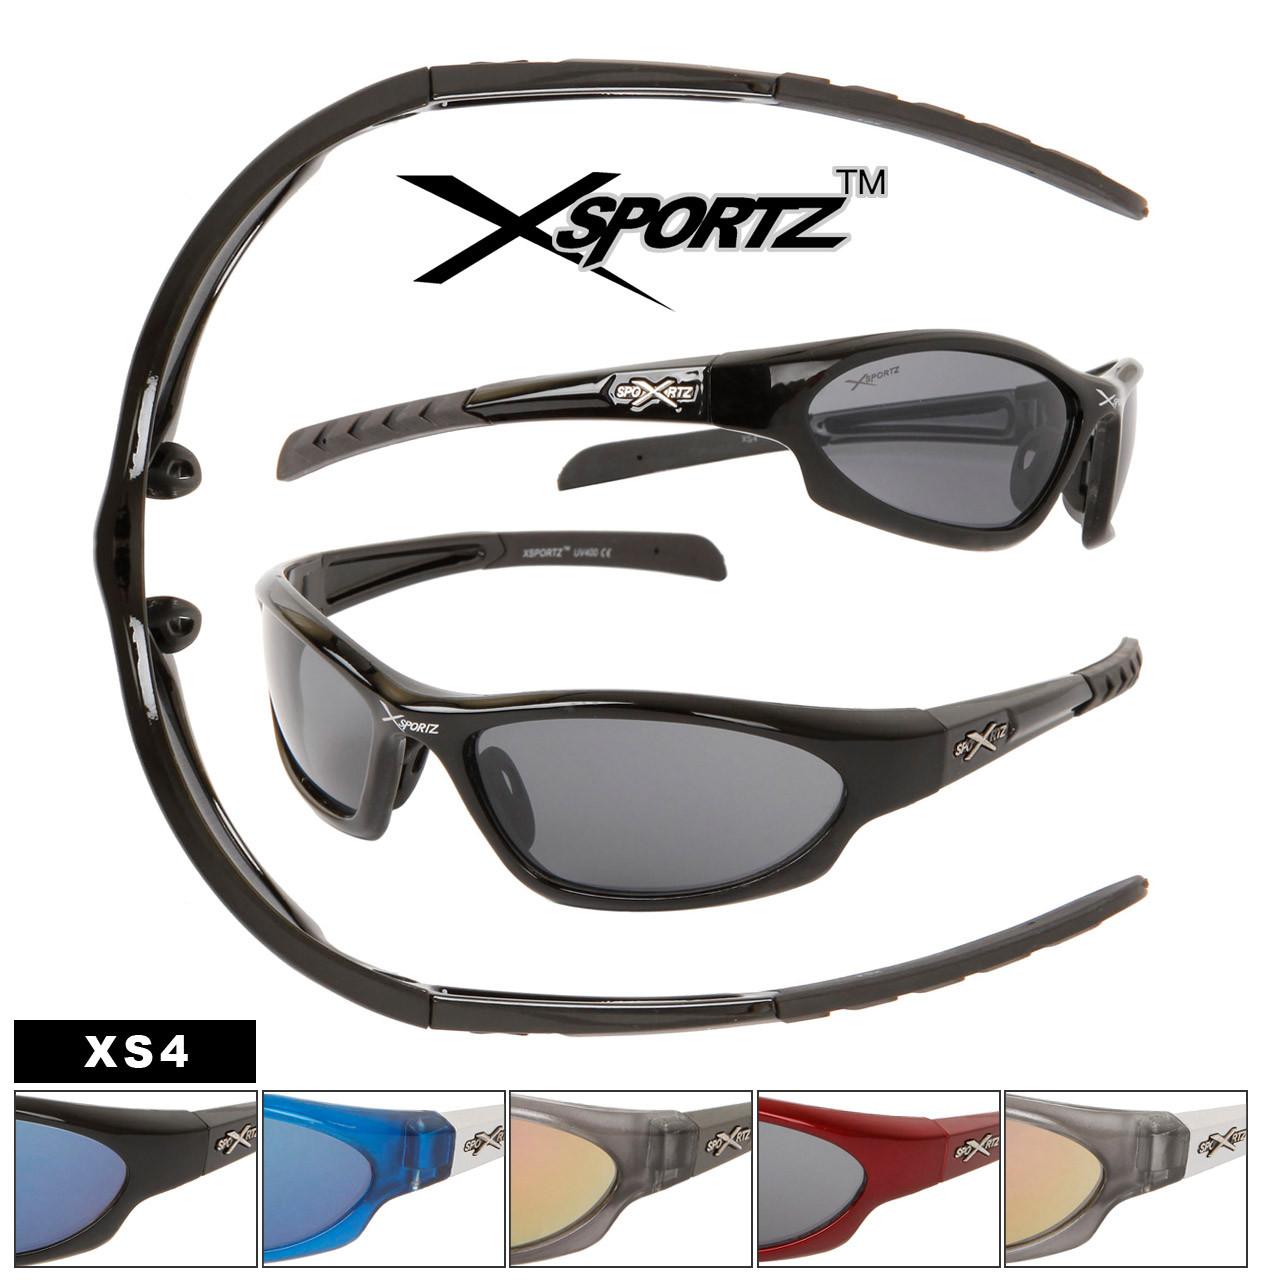 XS4 Xsportz™ Sunglasses